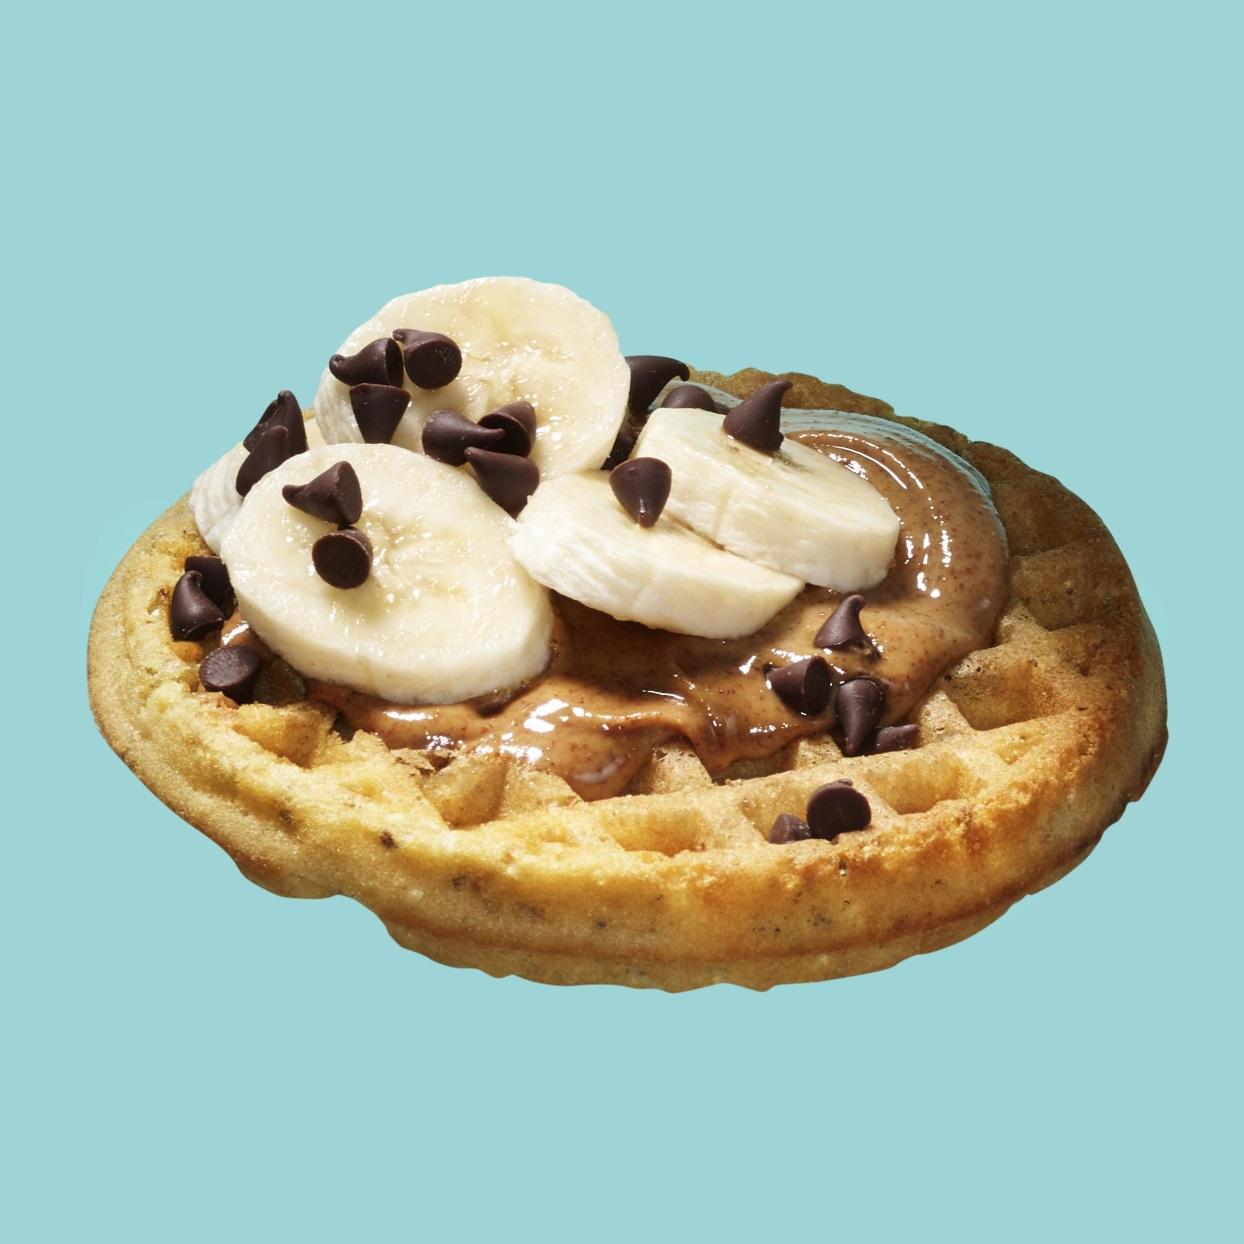 Waffle with Nut Butter, Banana & Chocolate Chips Joyce Hendley